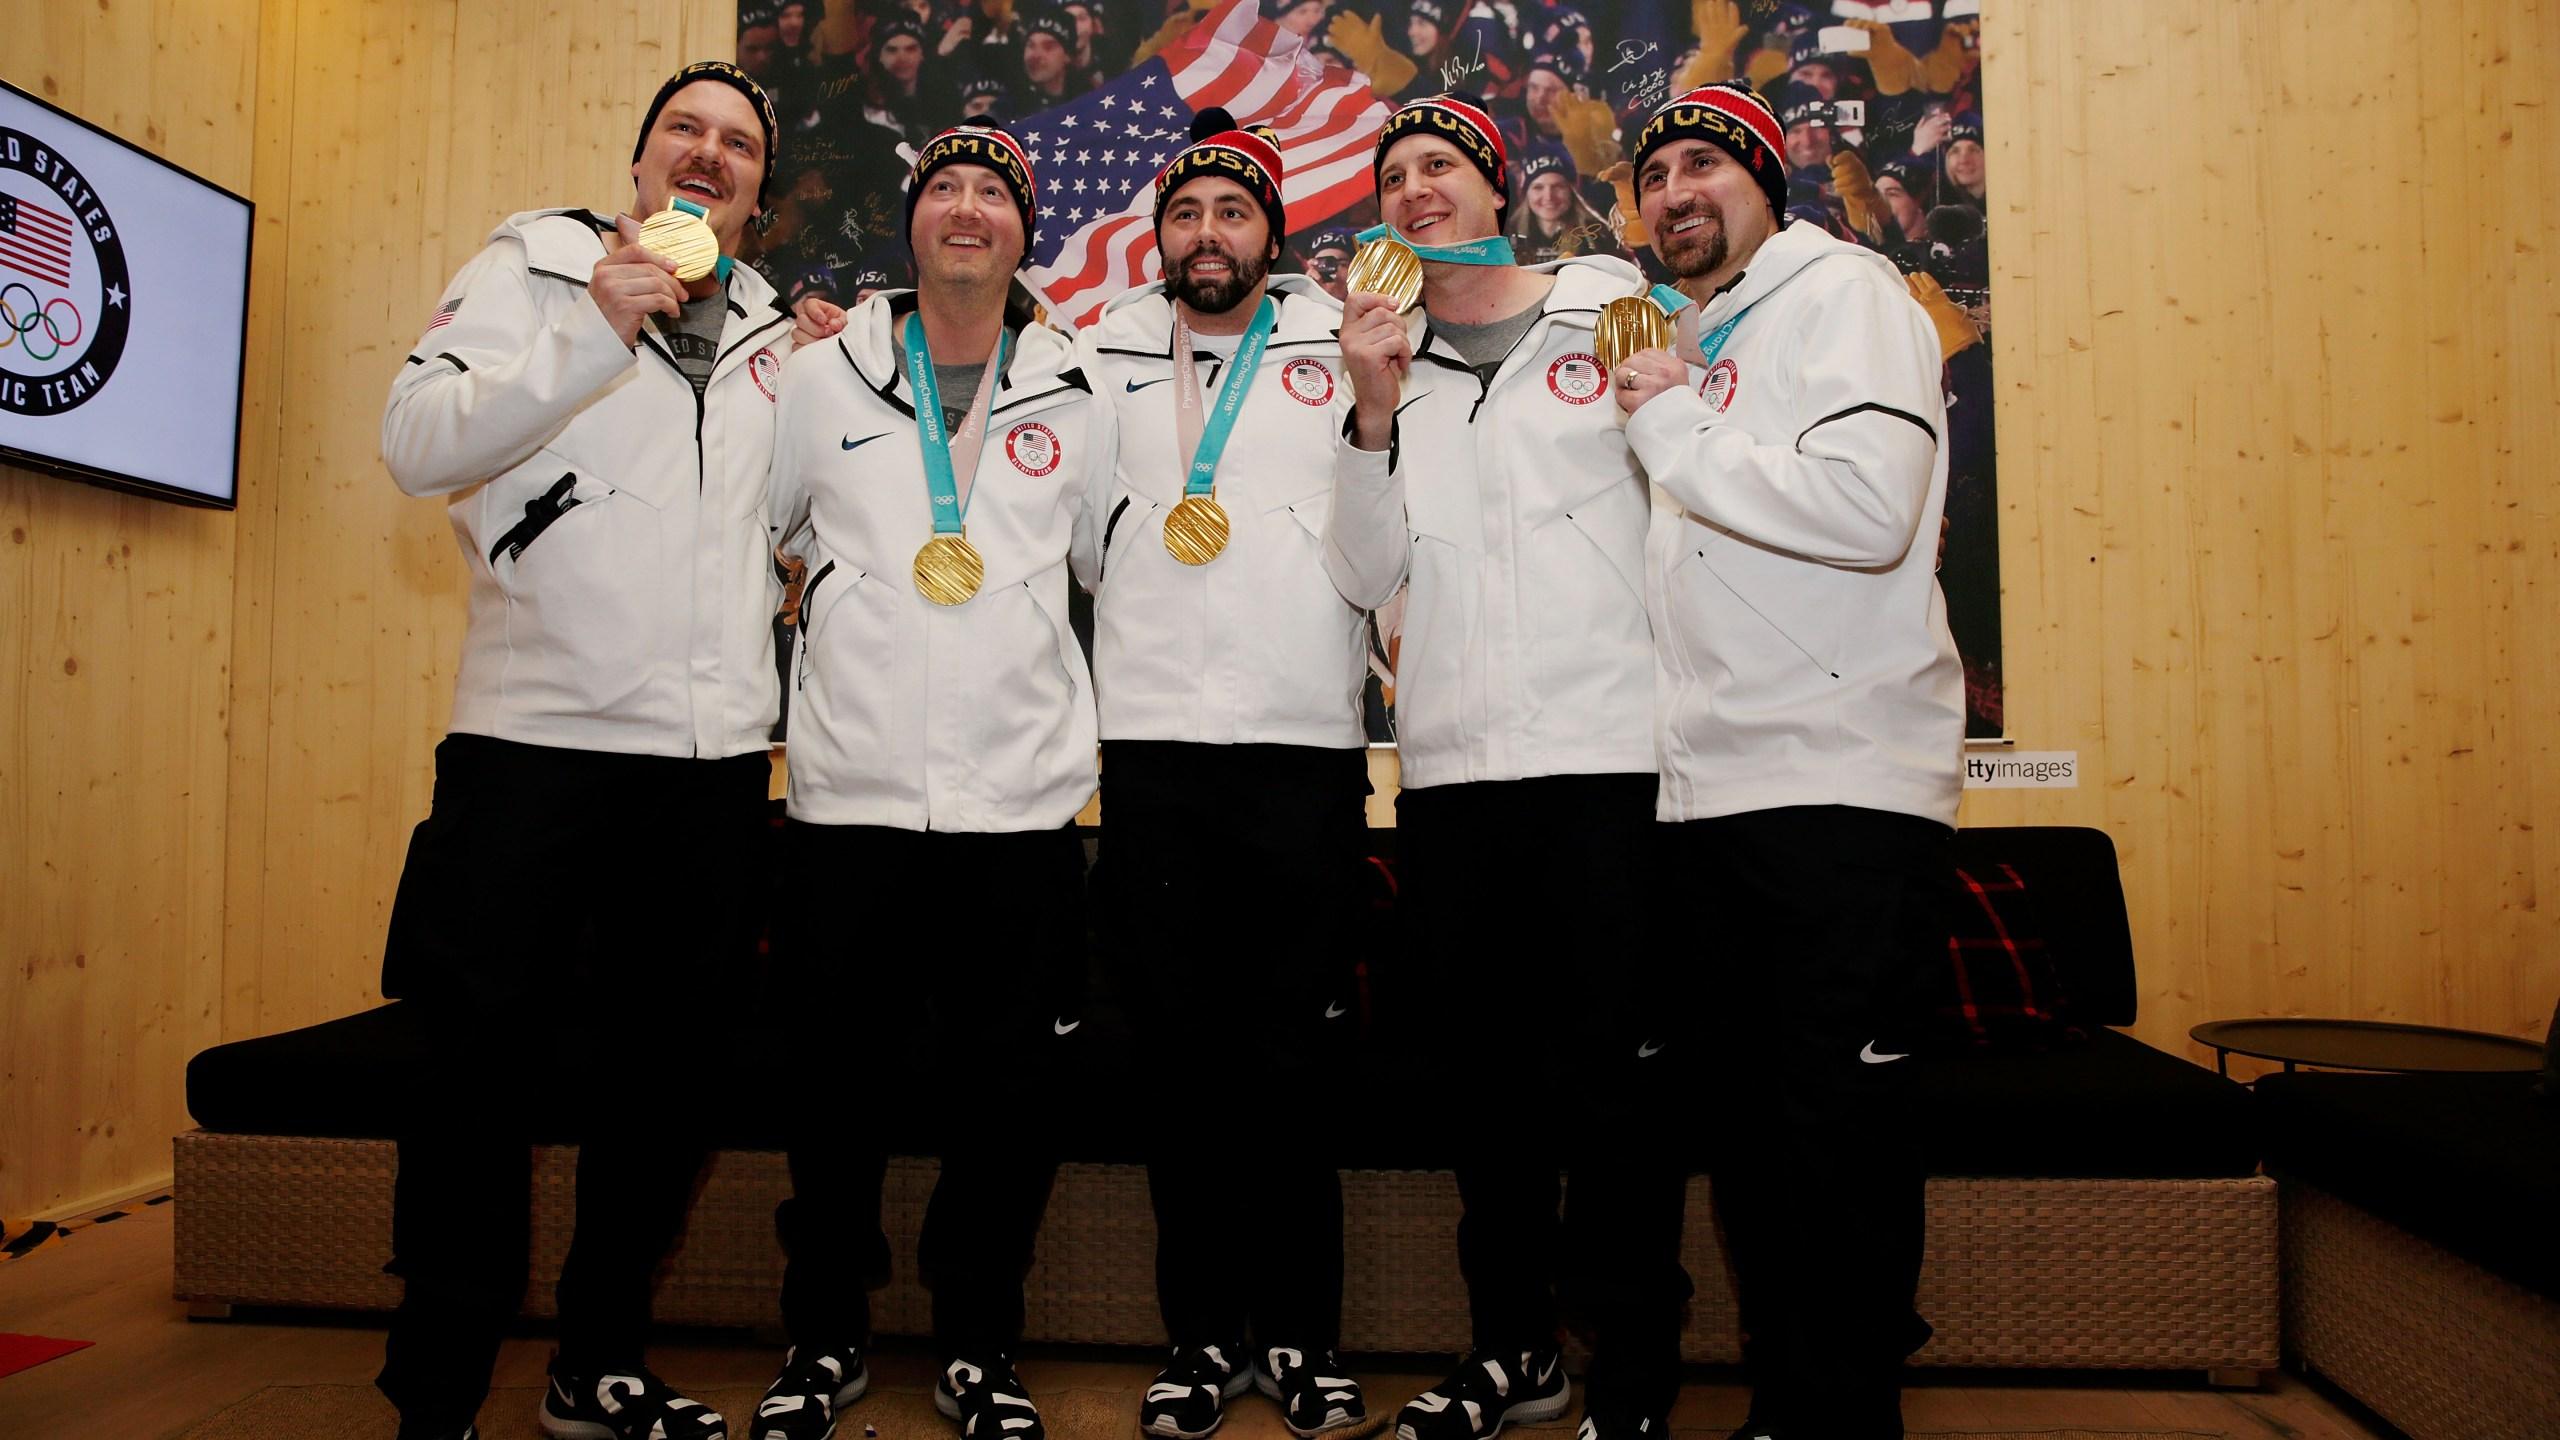 USA House at the PyeongChang 2018 Winter Olympic Games_300203